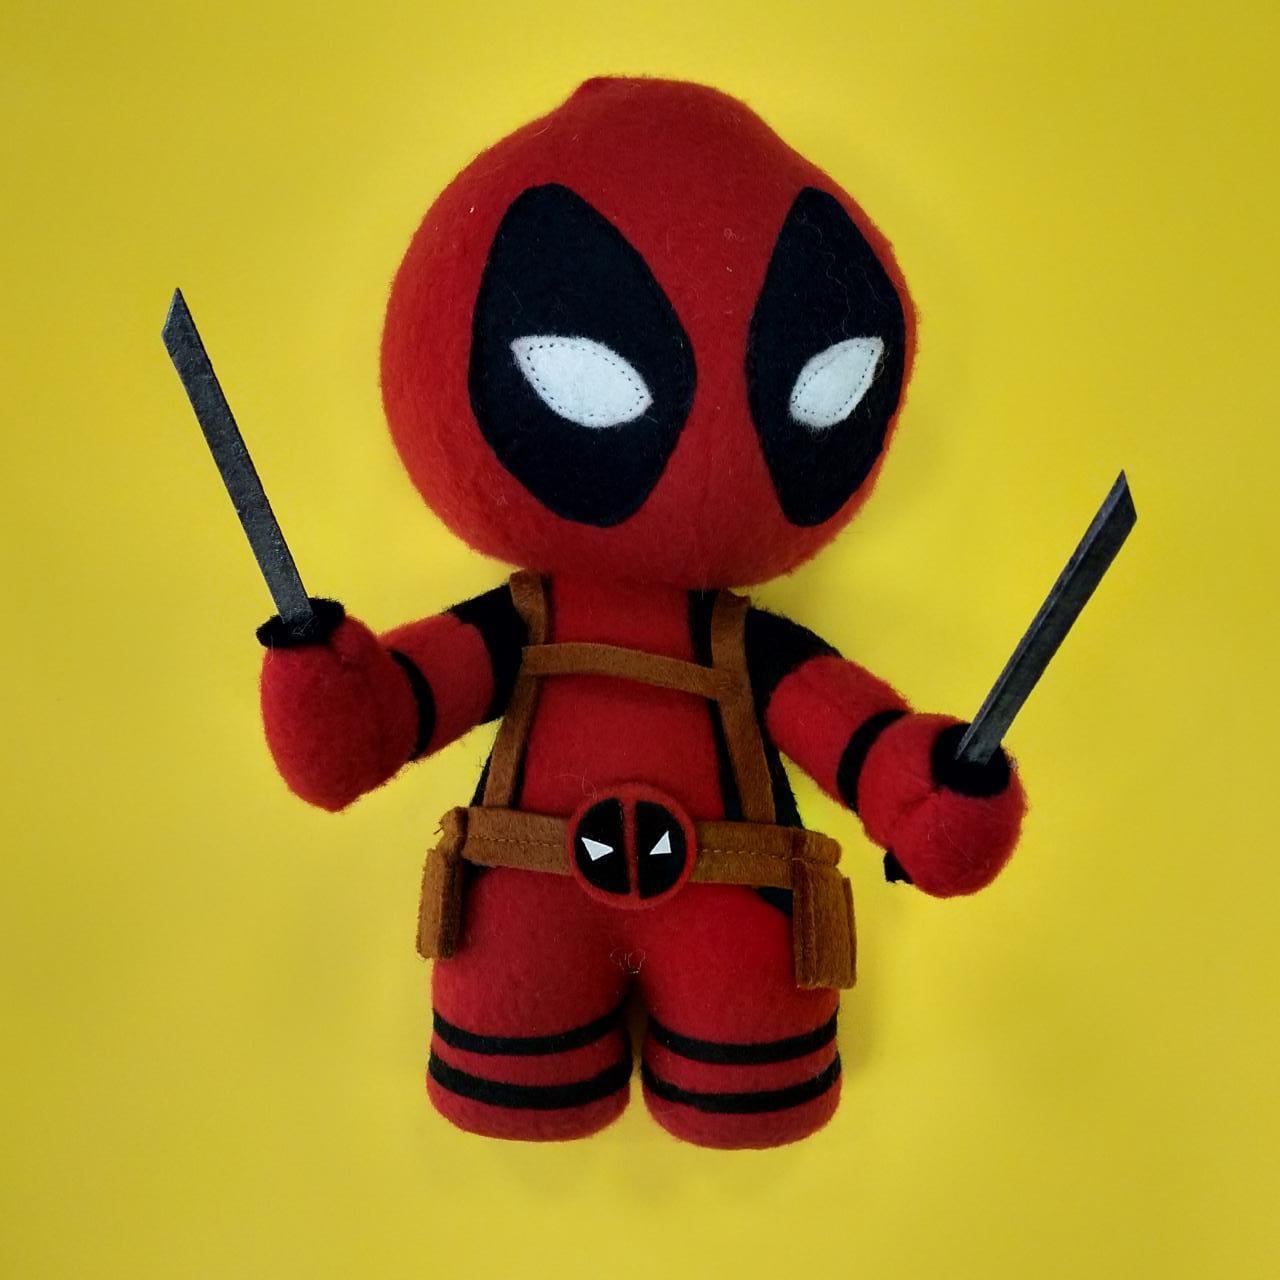 Мягкая игрушка Дедпул (Deadpool)